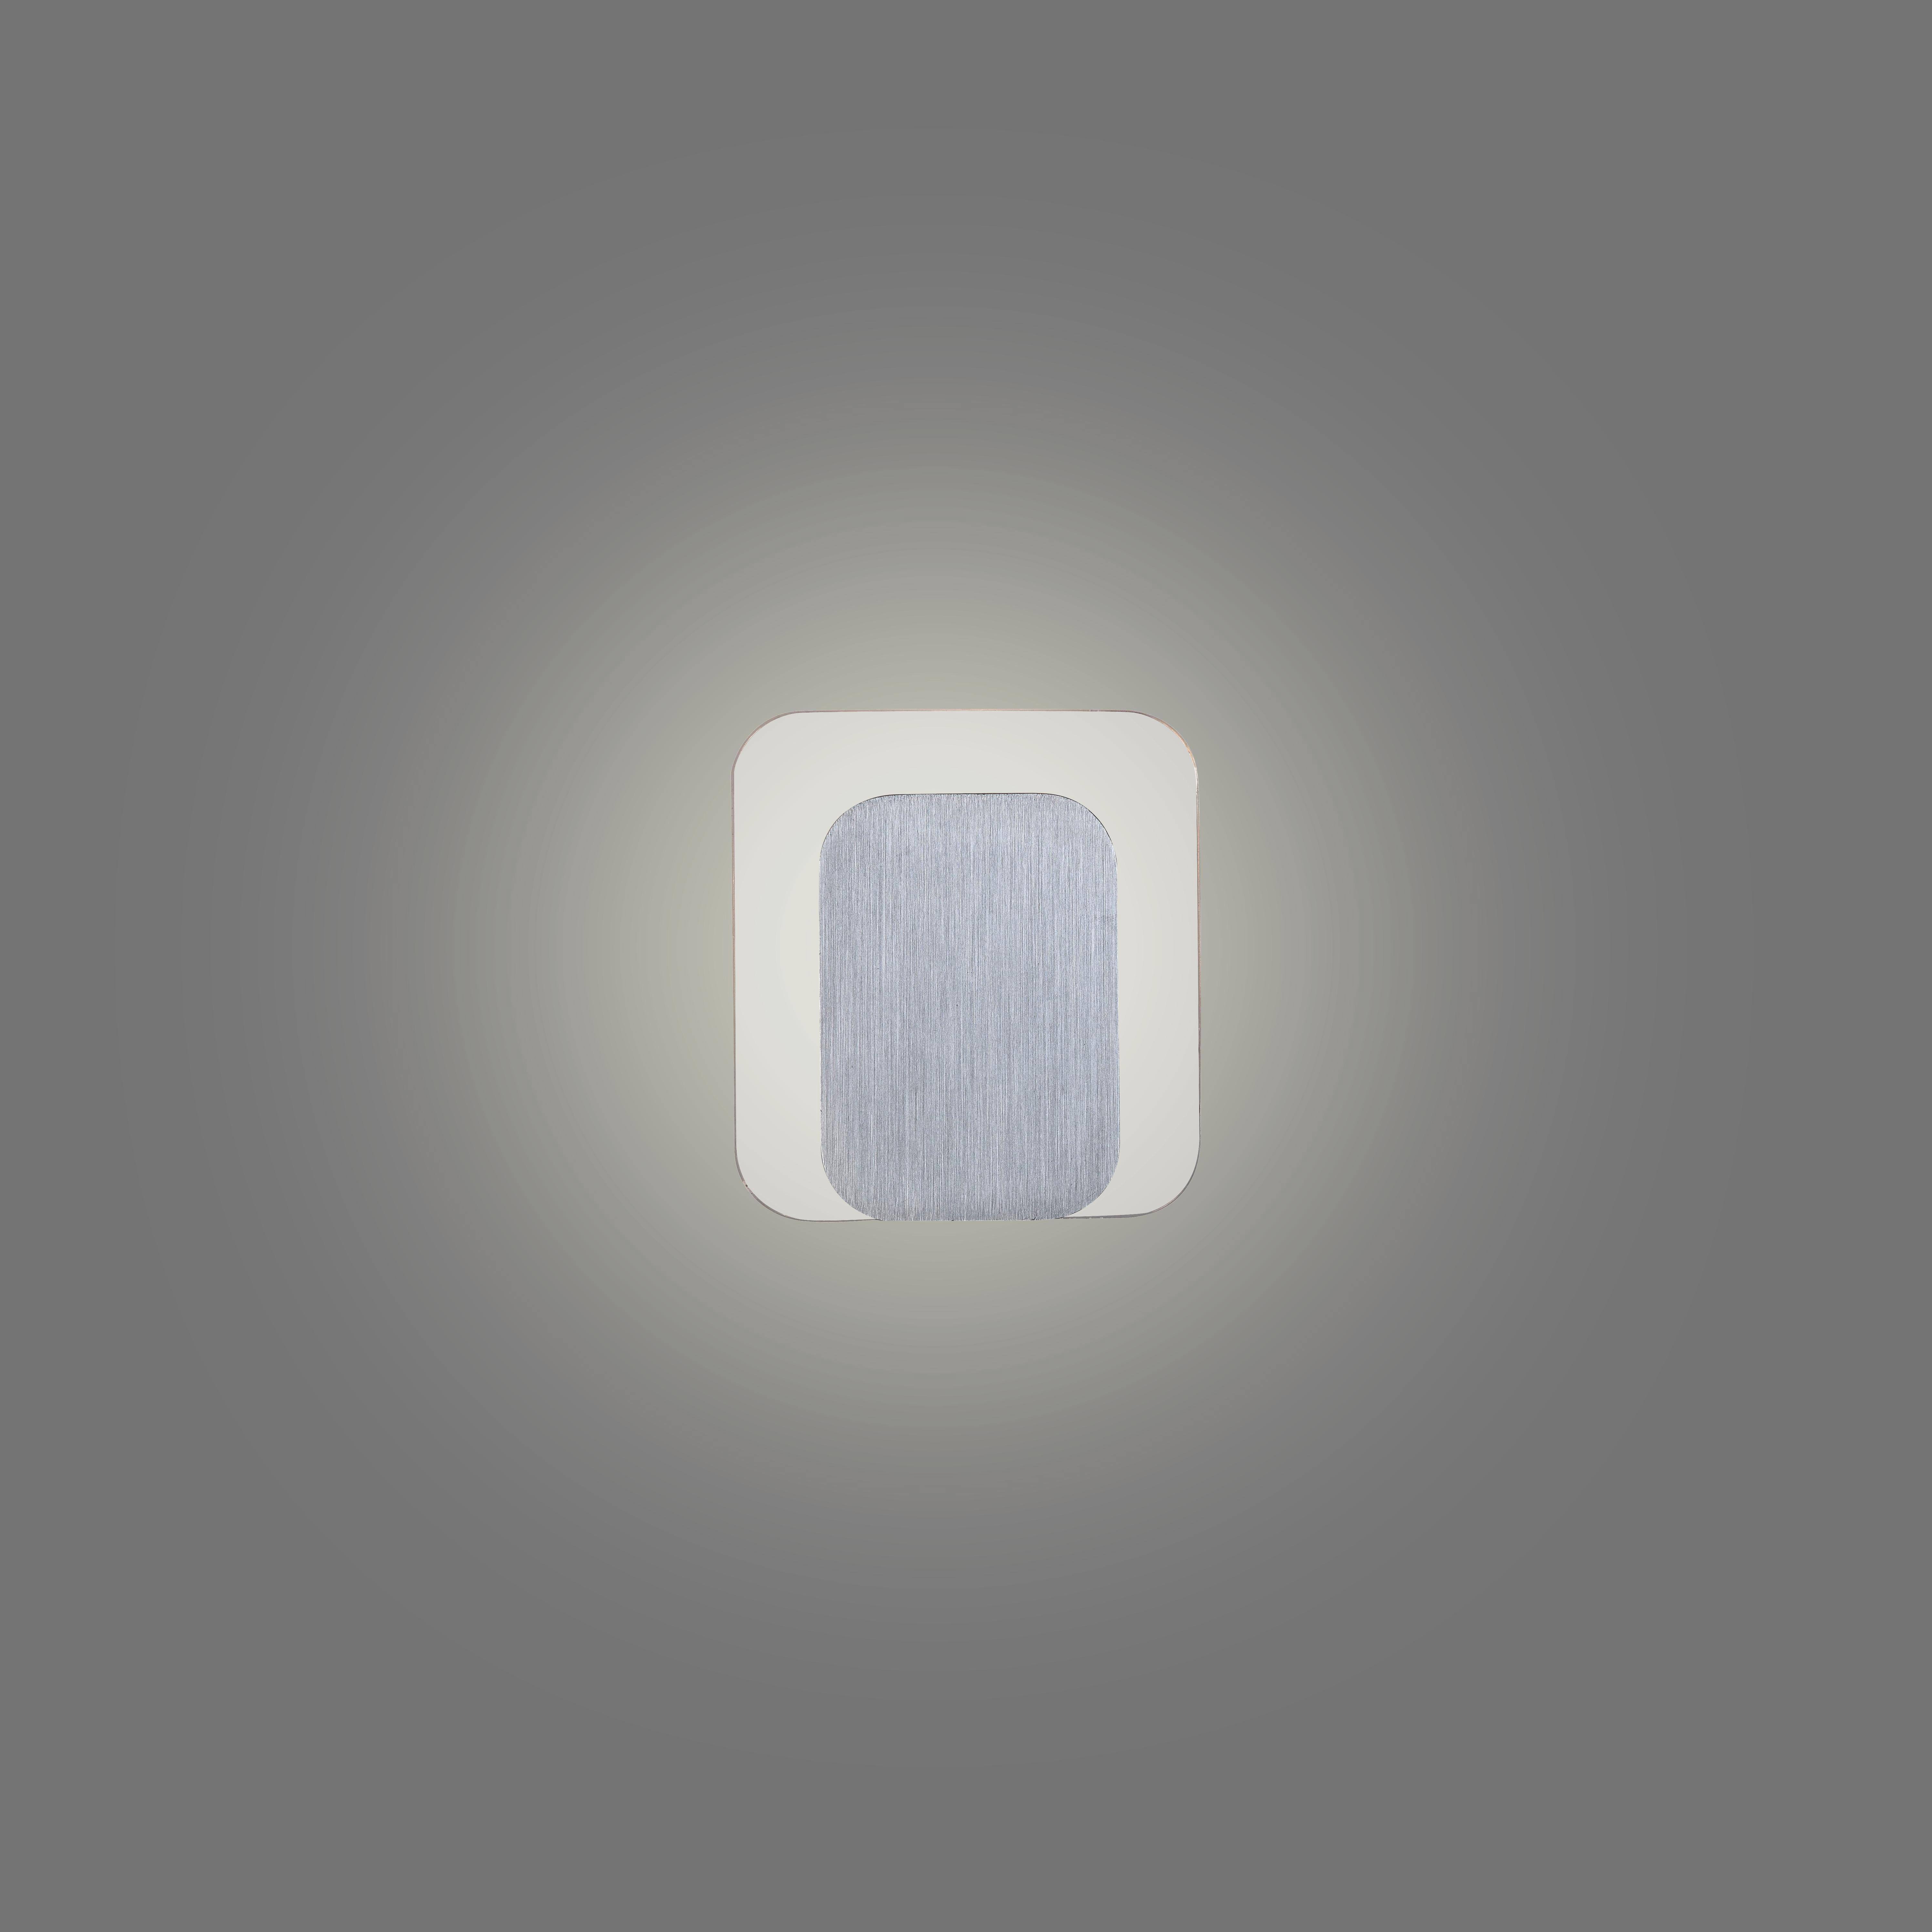 WANDLEUCHTE ISAAC - KONVENTIONELL, Kunststoff/Metall (11/12cm)